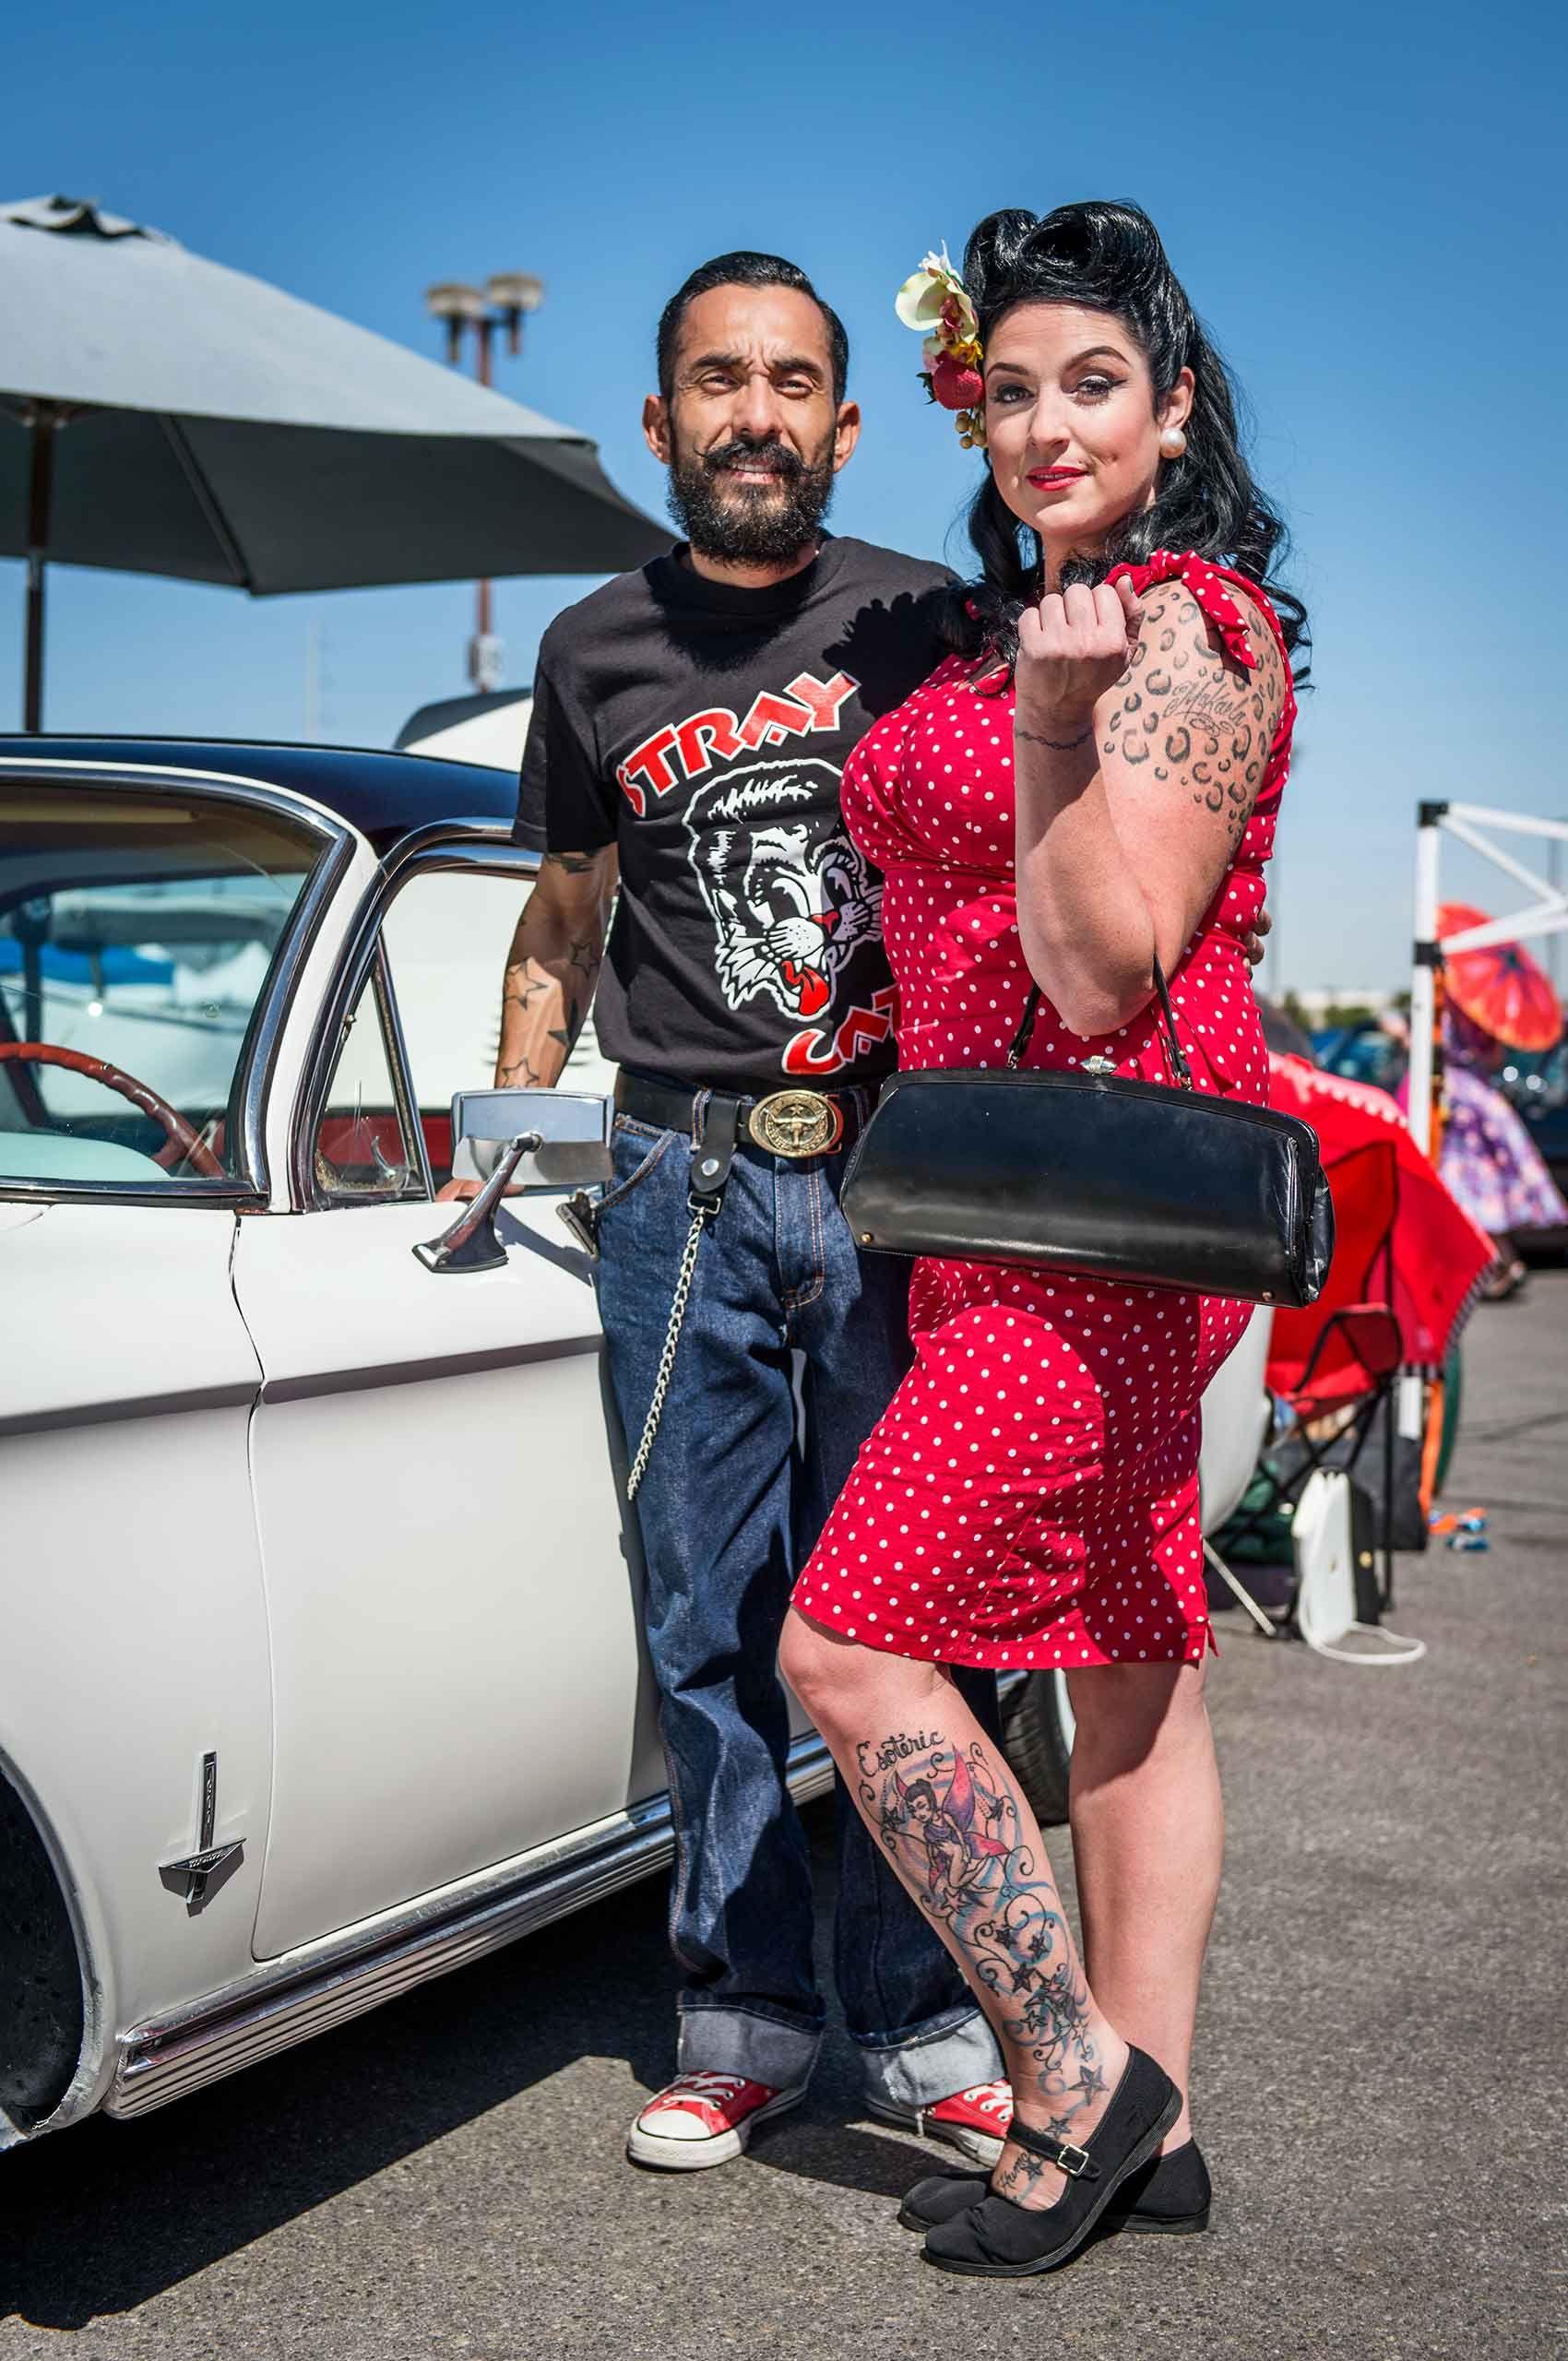 stylish-couple-vivalasvegas-rockabillyweekend-lasvegas-by-henrikolundphotography.jpg